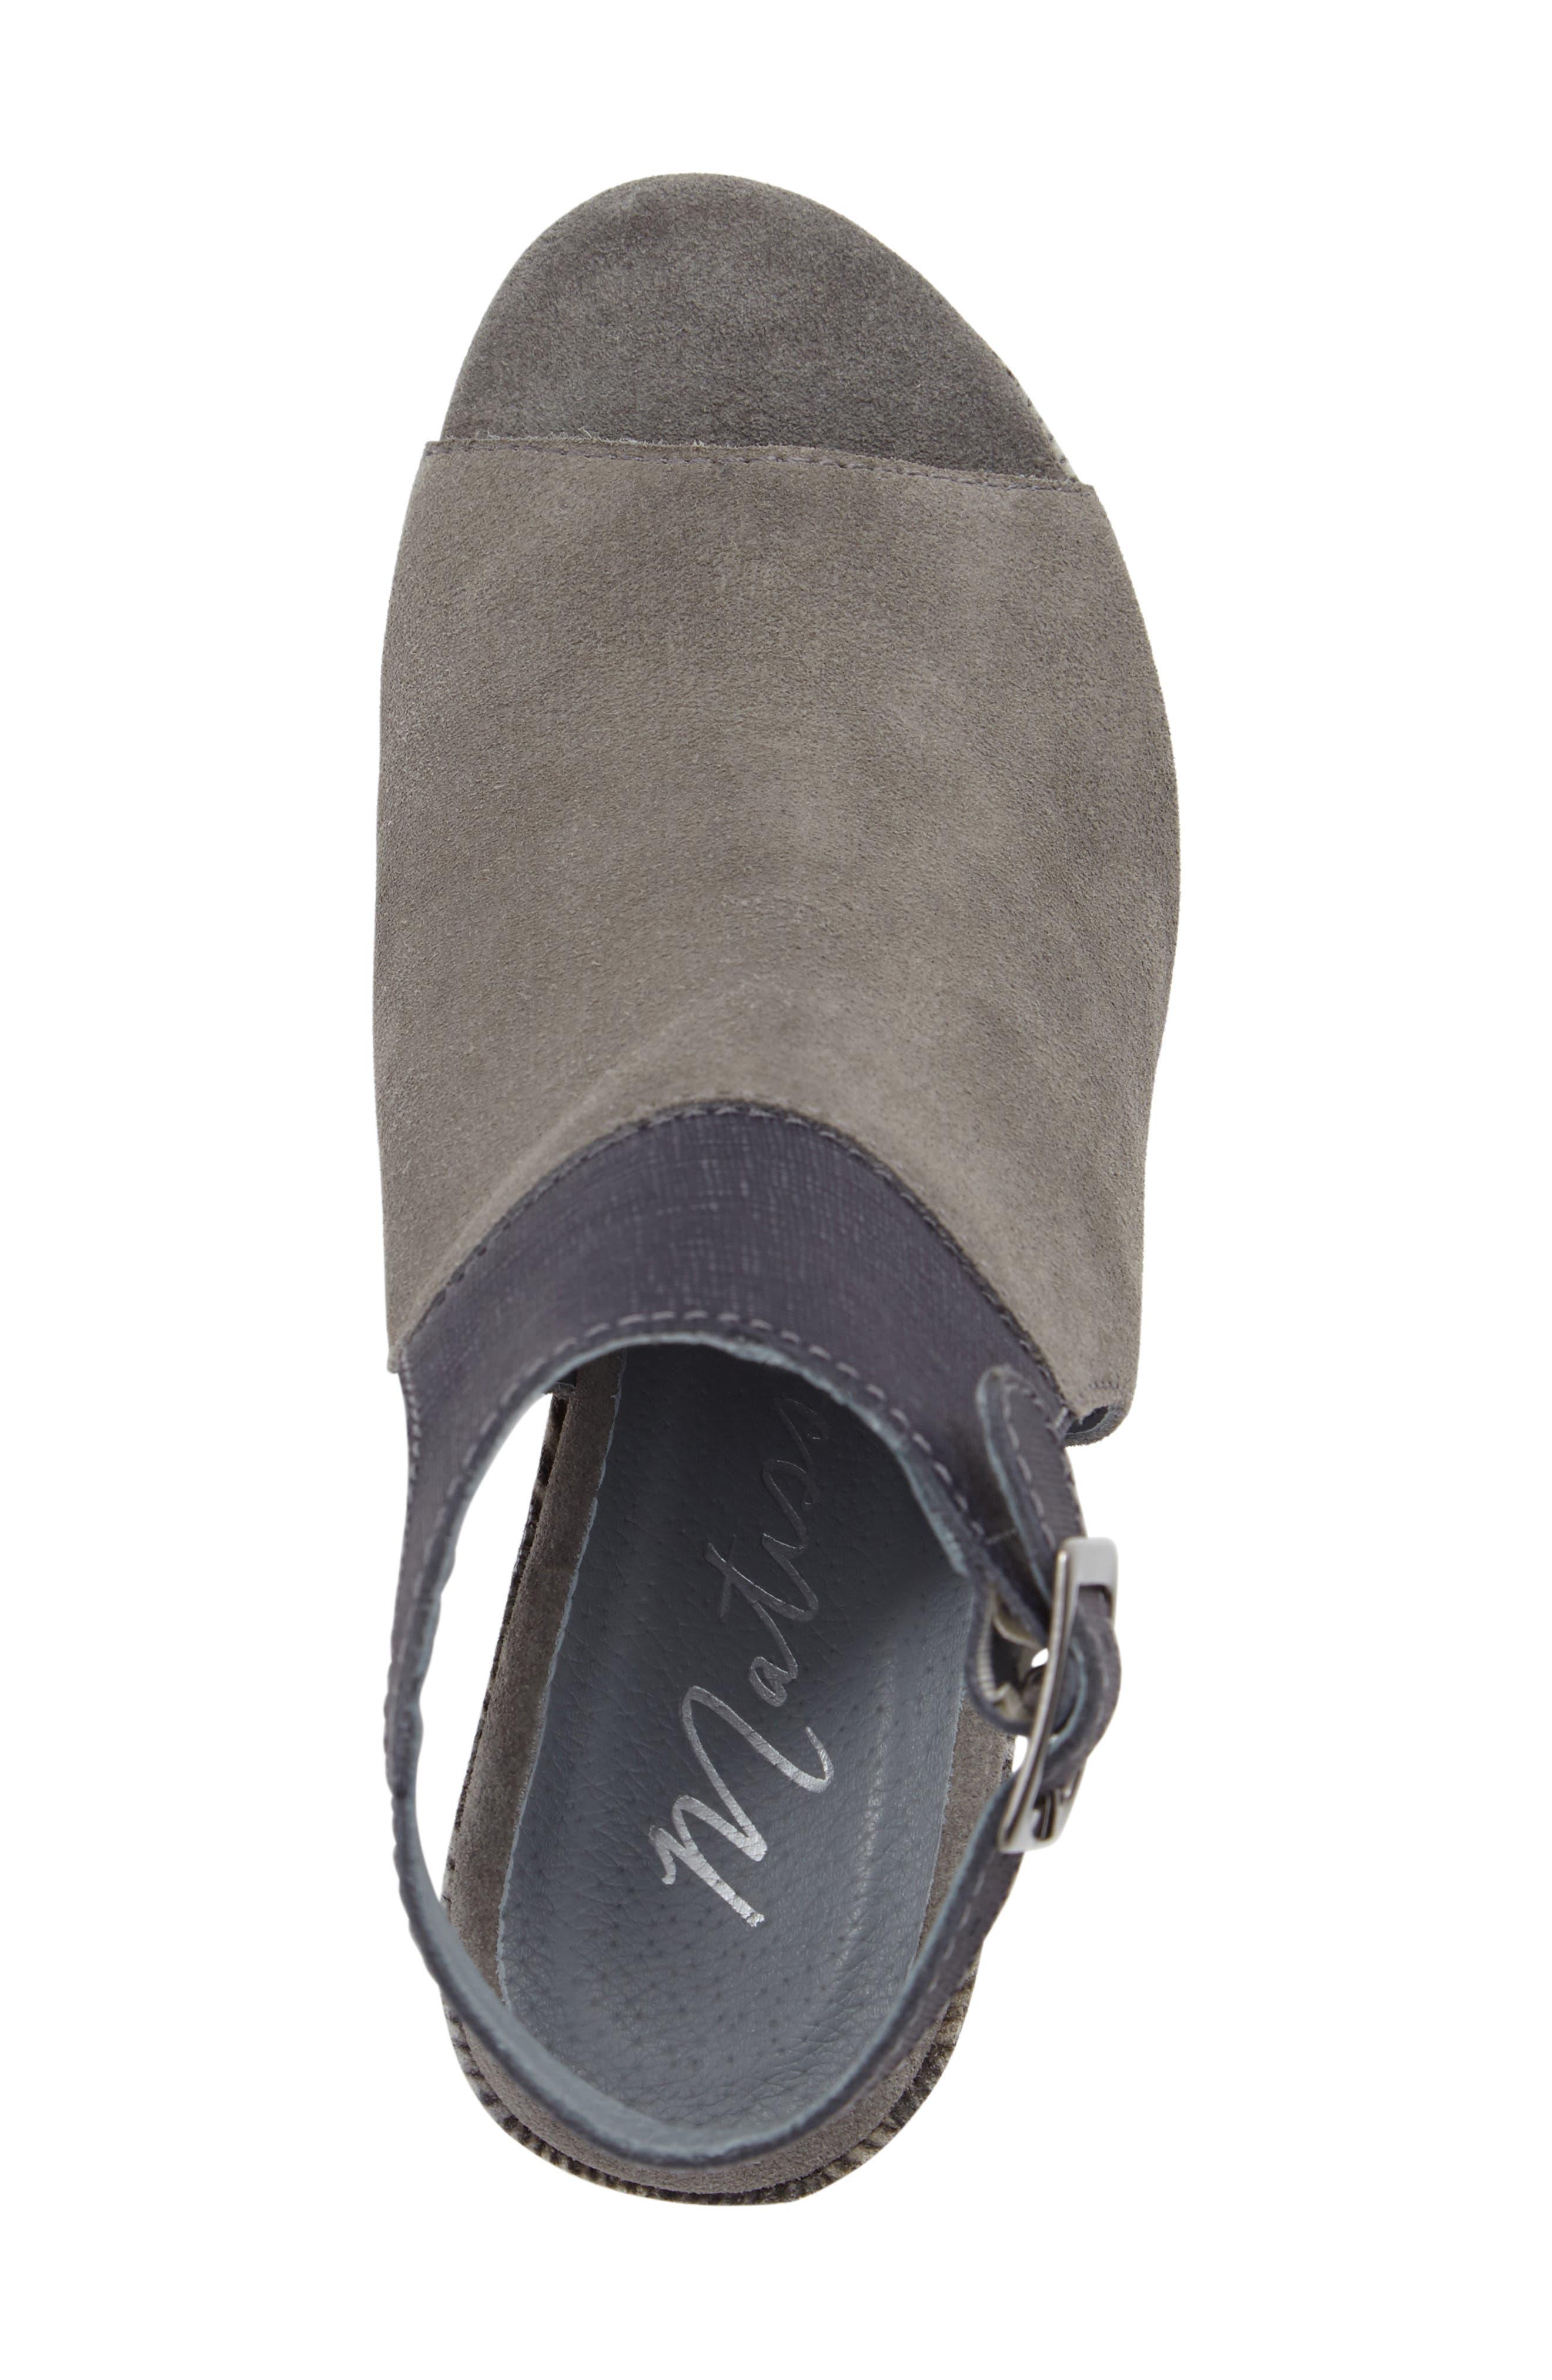 Harlequin Wedge Sandal,                             Alternate thumbnail 5, color,                             029